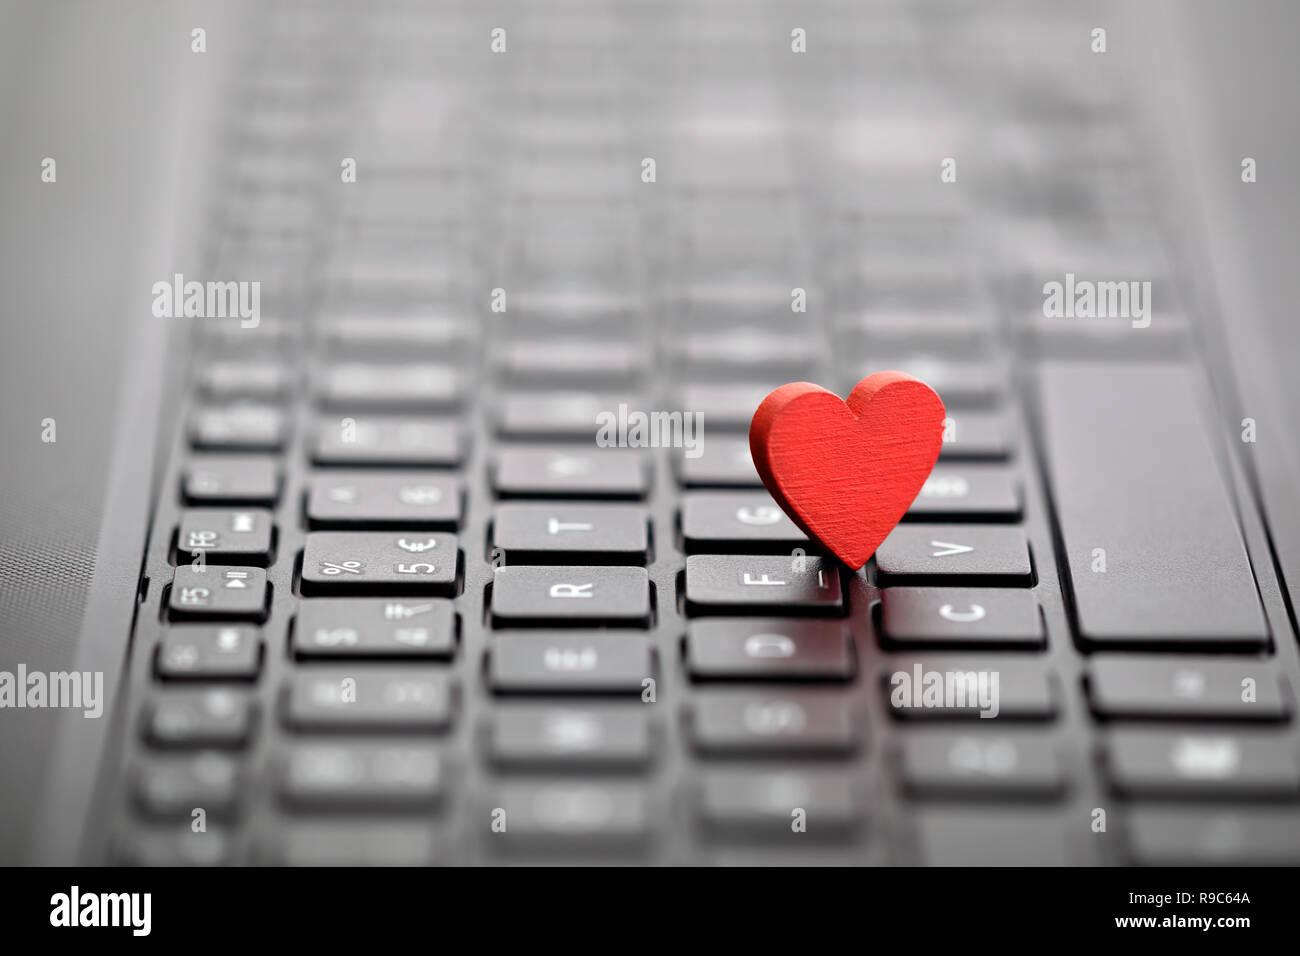 Exklusive Dating-Seiten toronto